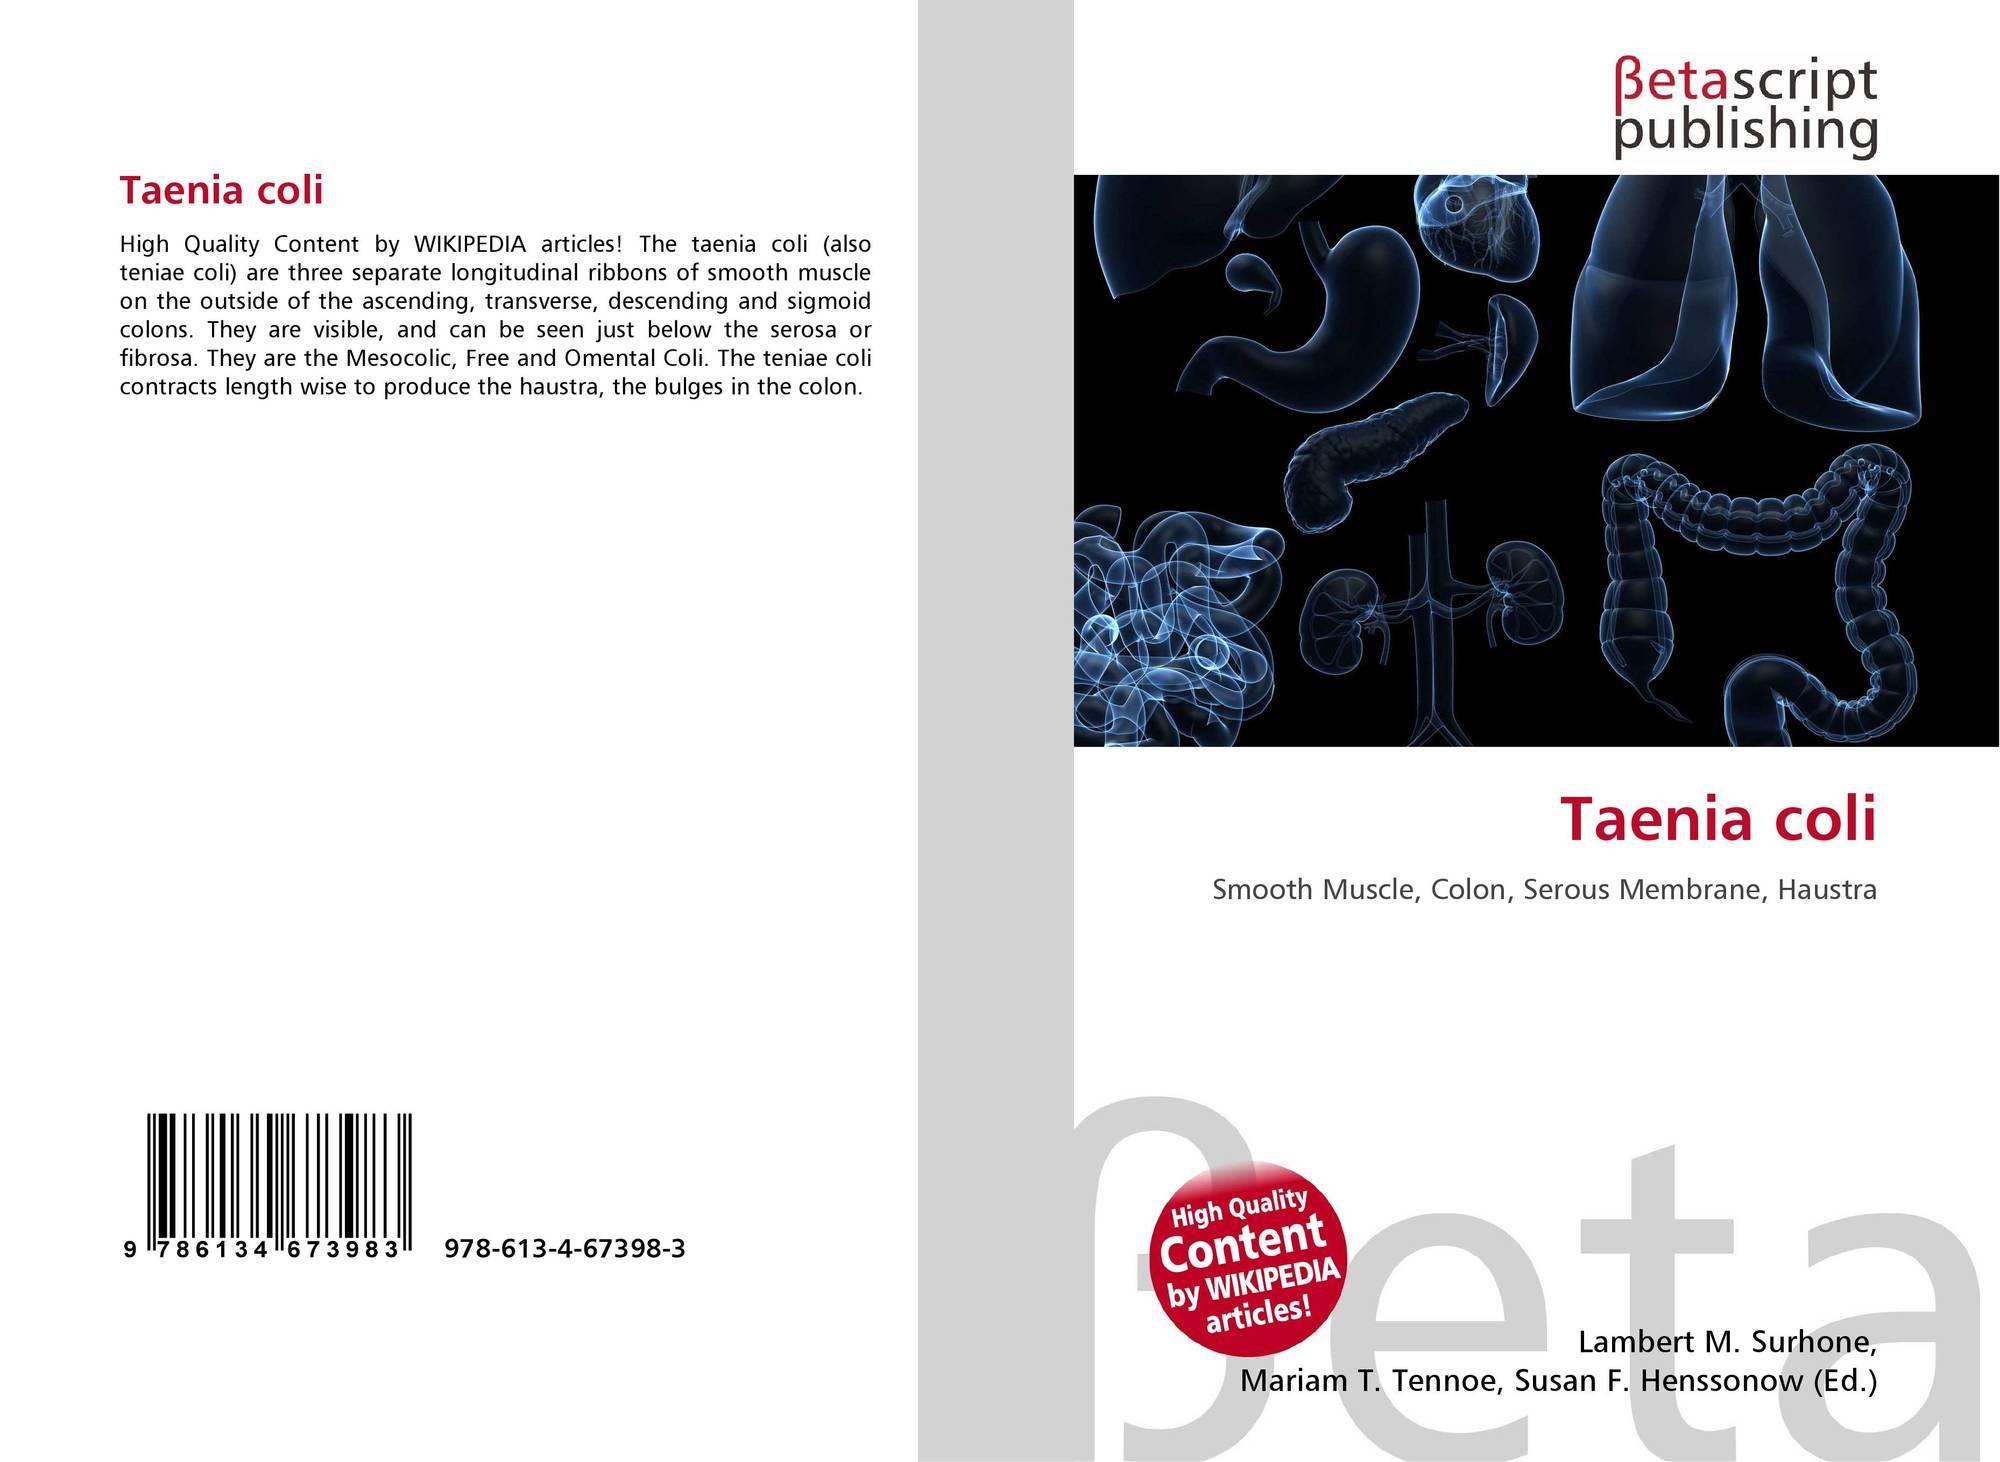 Taenia coli, 978-613-4-67398-3, 6134673986 ,9786134673983